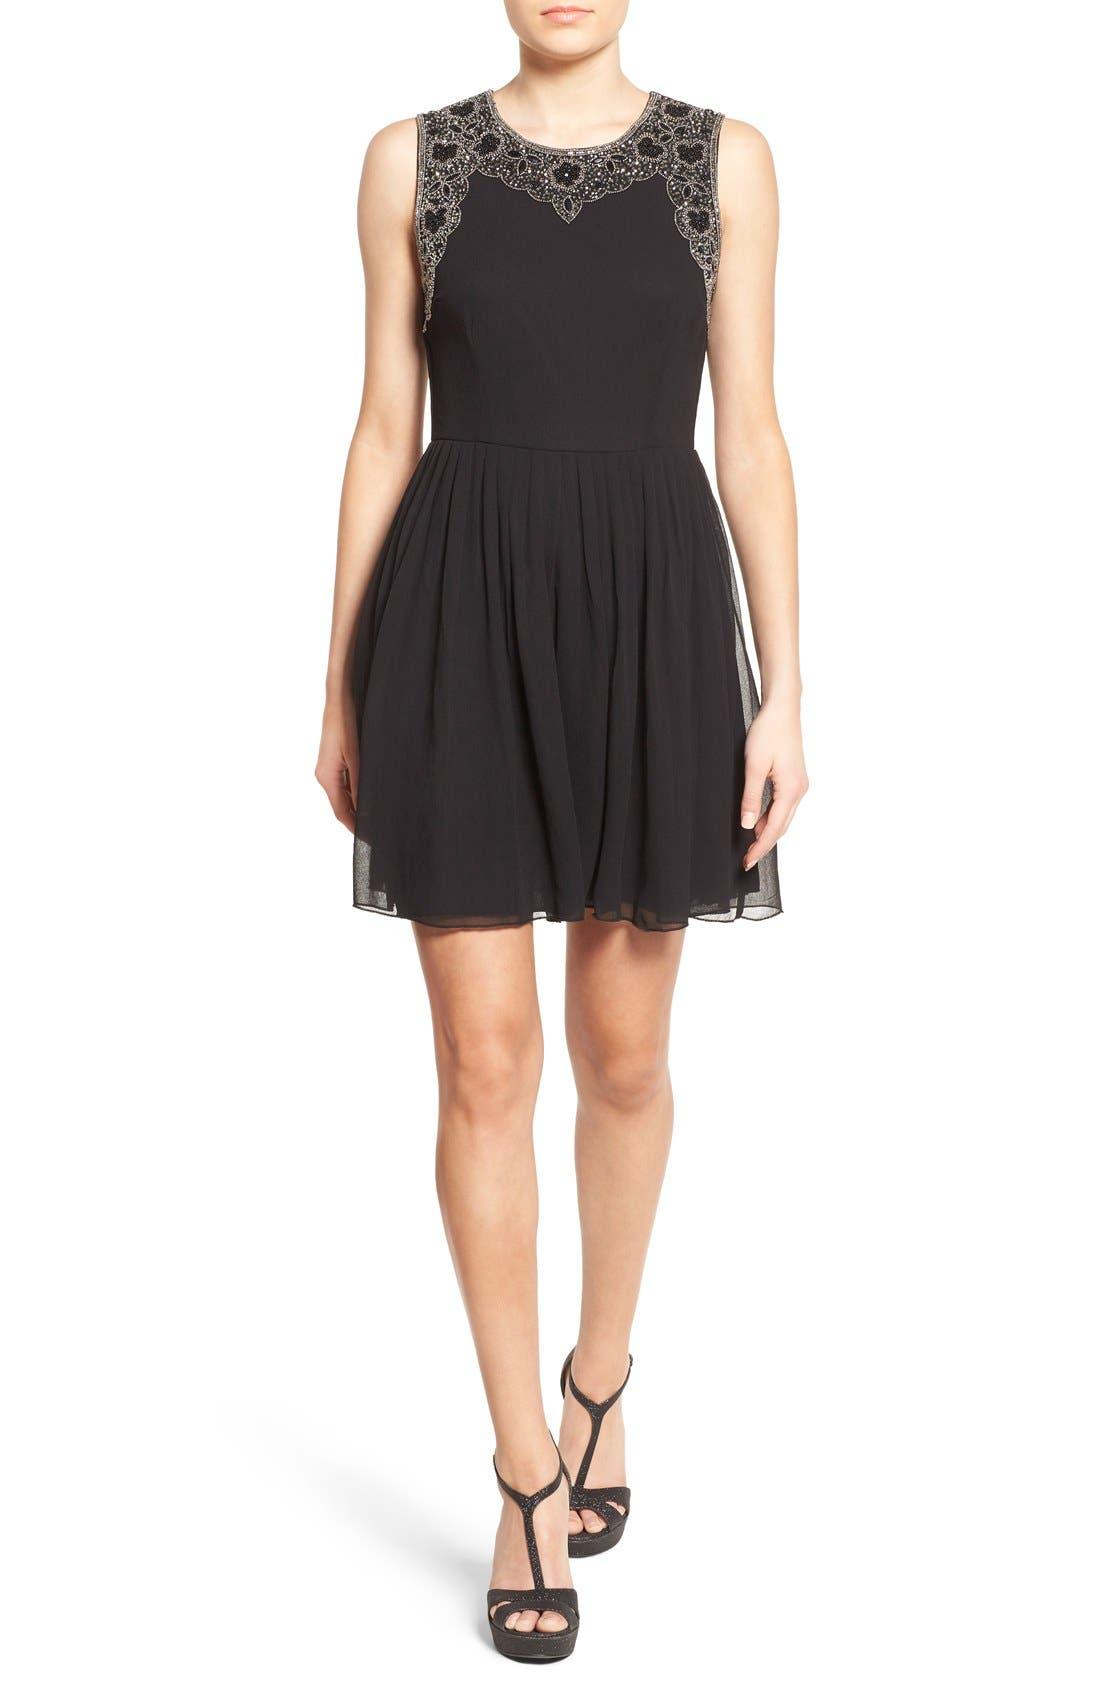 Main Image - Lace & Beads 'Becky' Embellished Skater Dress